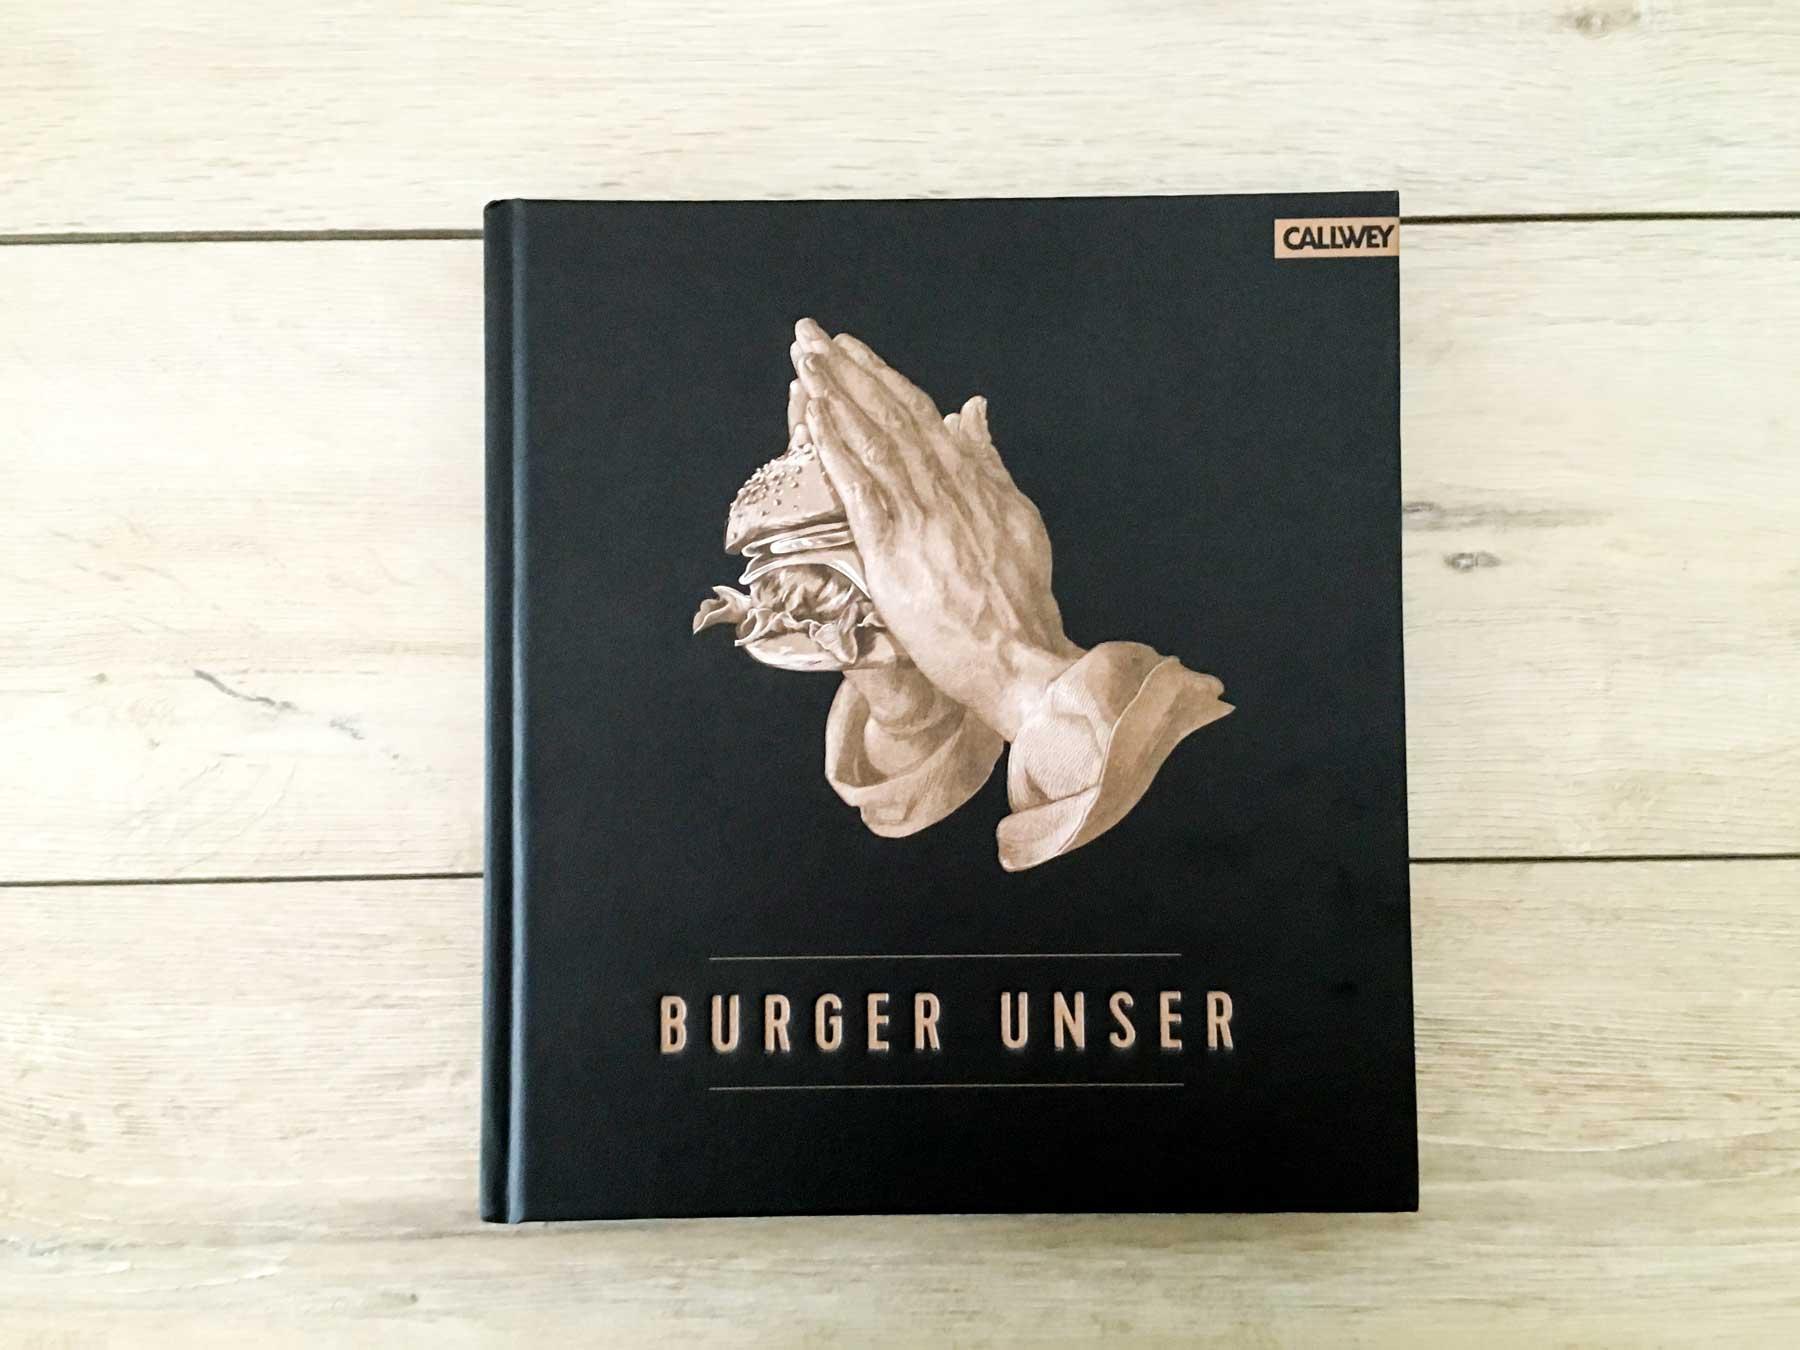 BurgerUnser_002.jpg